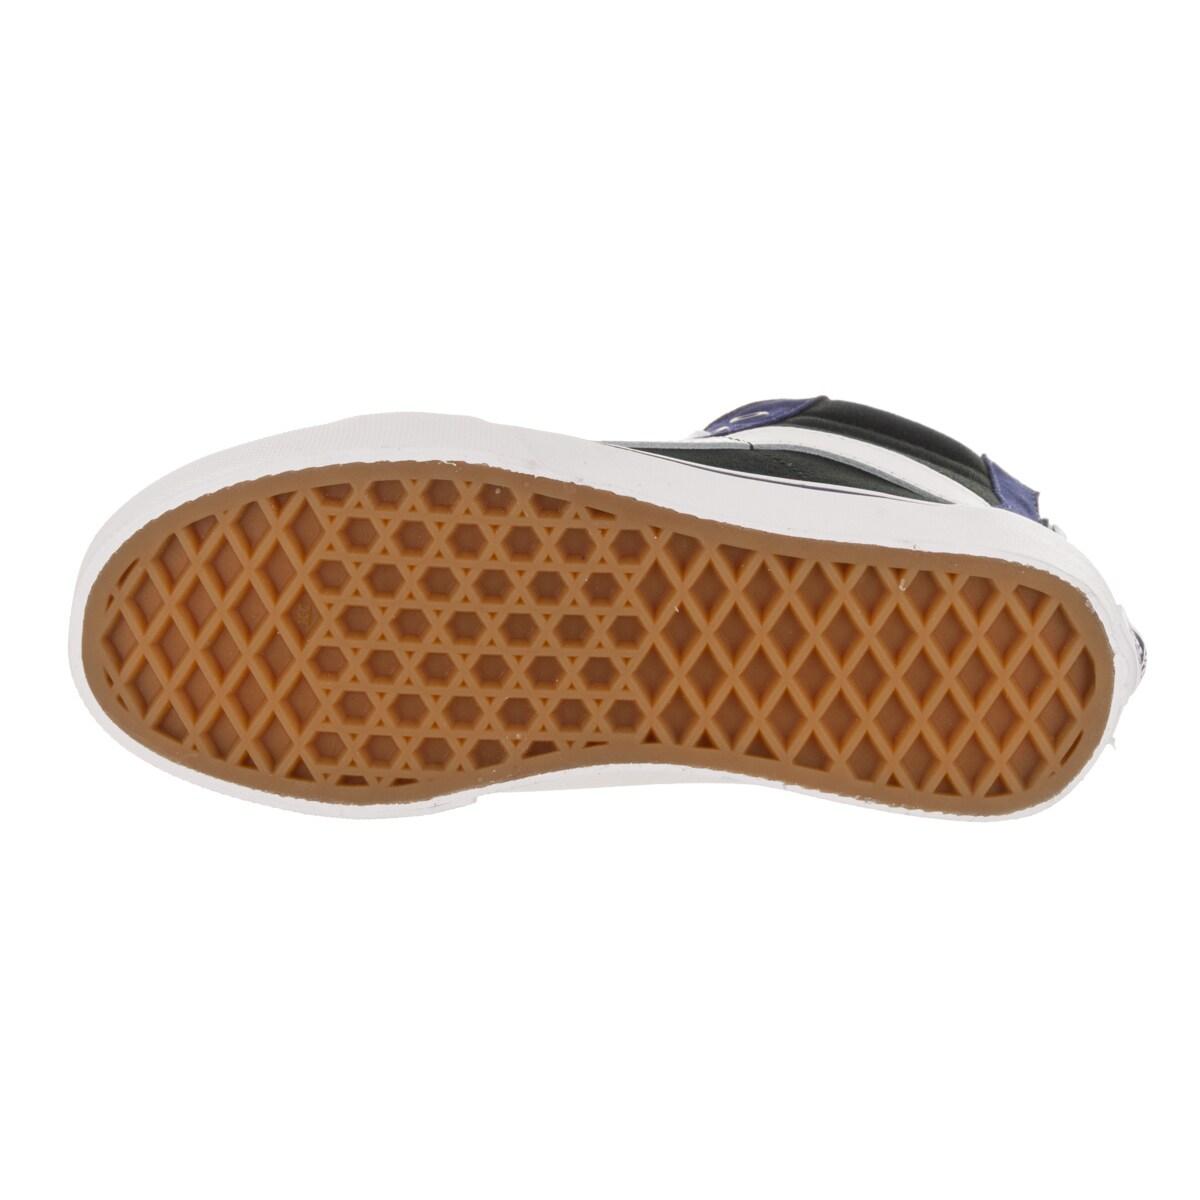 9318bc625f4ed8 Shop Vans Kids Sk8-Hi Zip (Pop) Skate Shoe - Free Shipping Today -  Overstock - 16431955